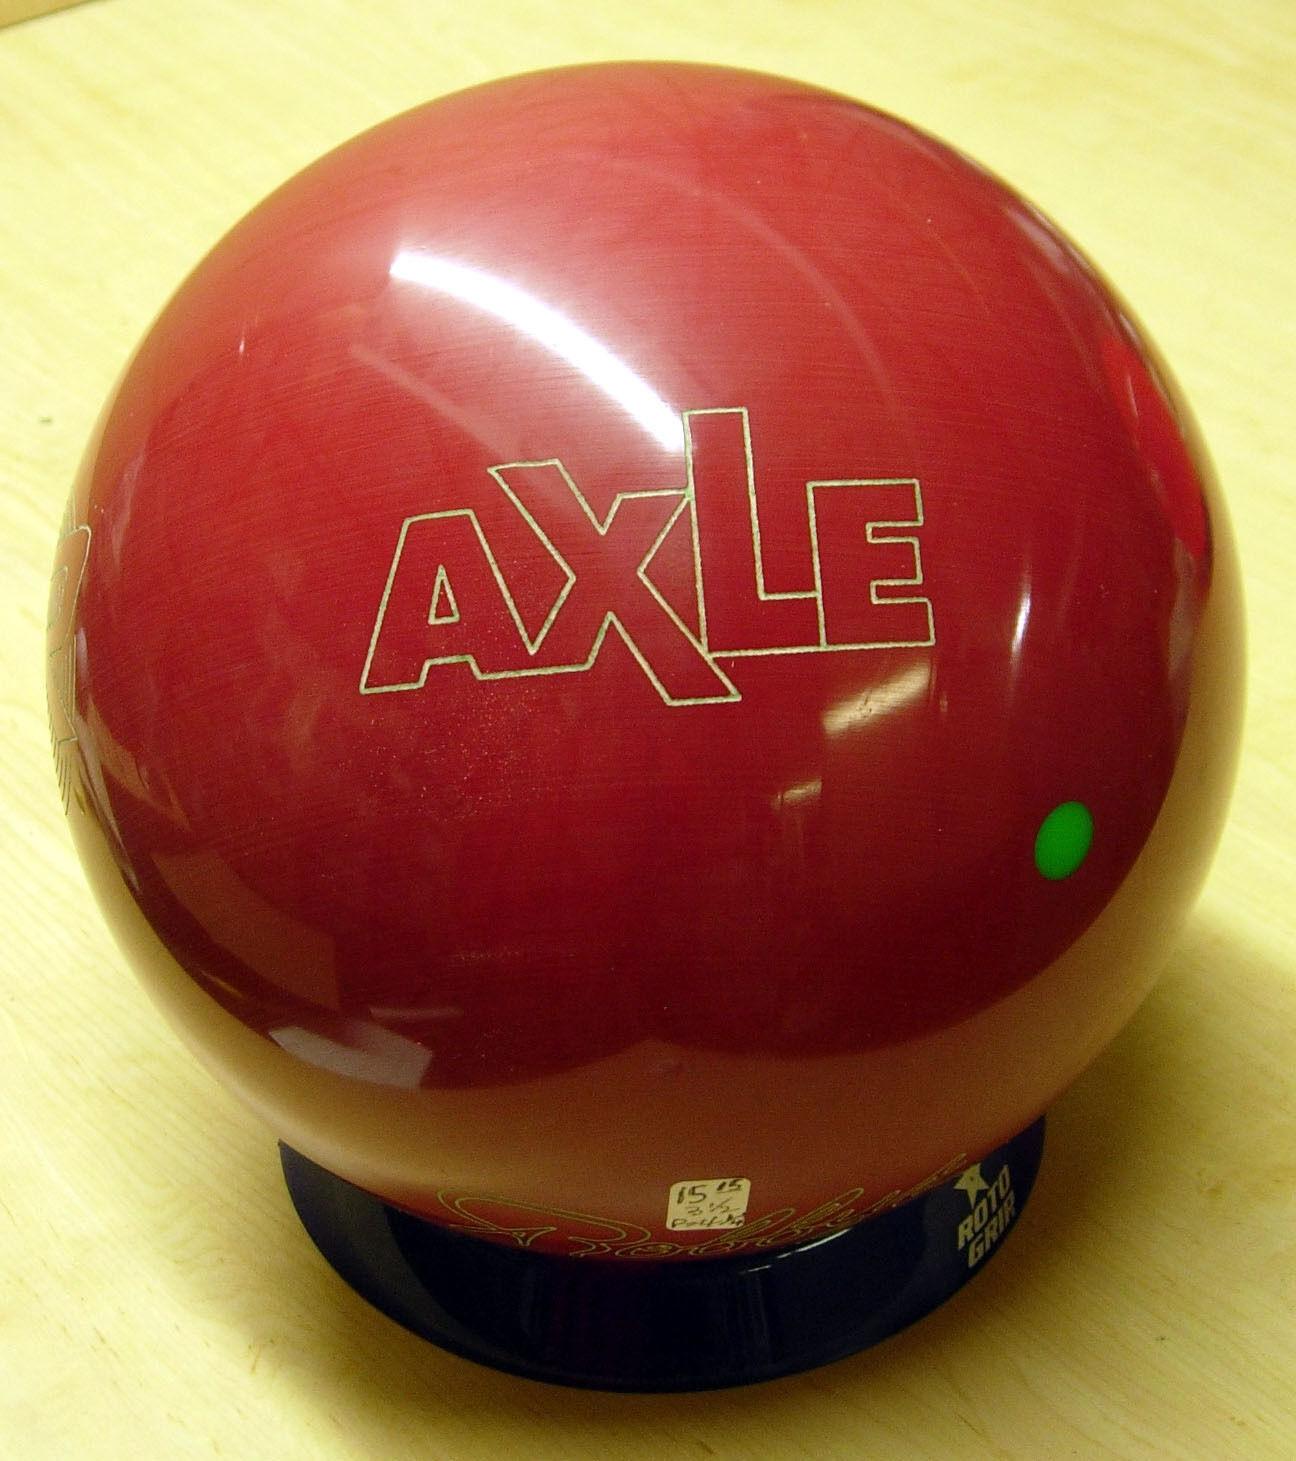 = 16Old Display Ball no original box Undrilled 1995 Robby AXLE Bowling Ball